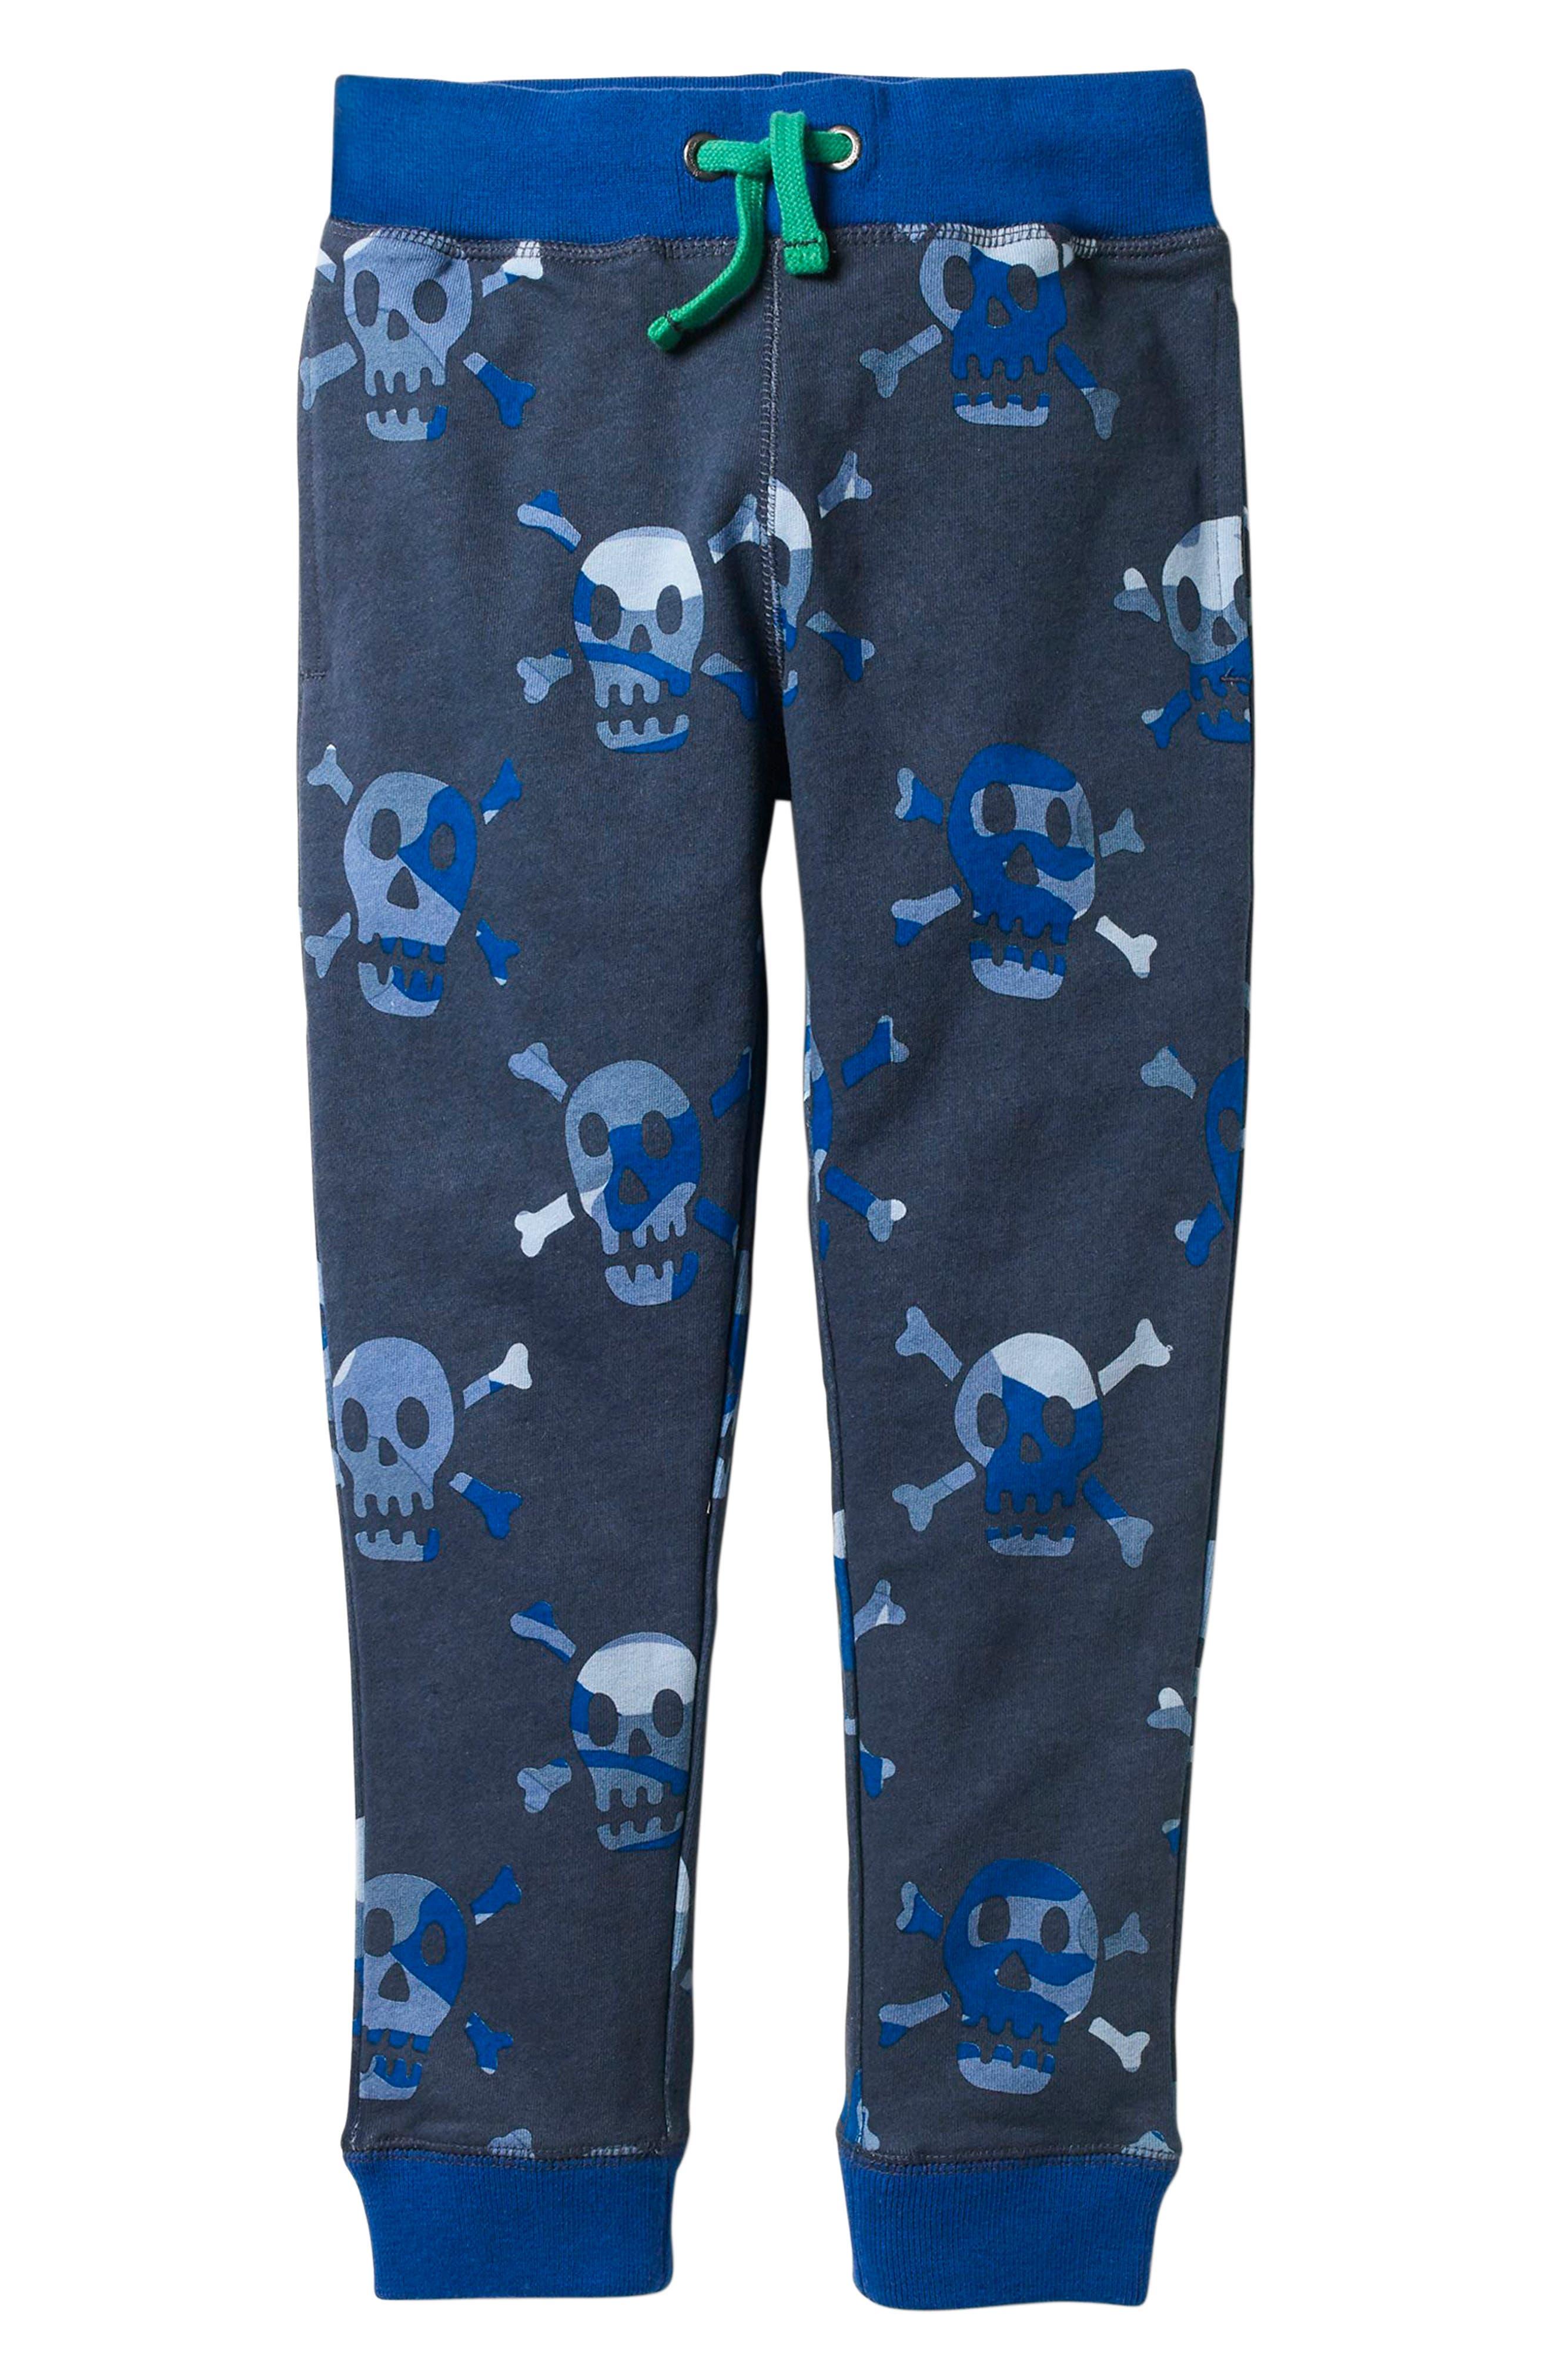 Graphic Print Sweatpants,                             Main thumbnail 1, color,                             School Navy Camo Skulls